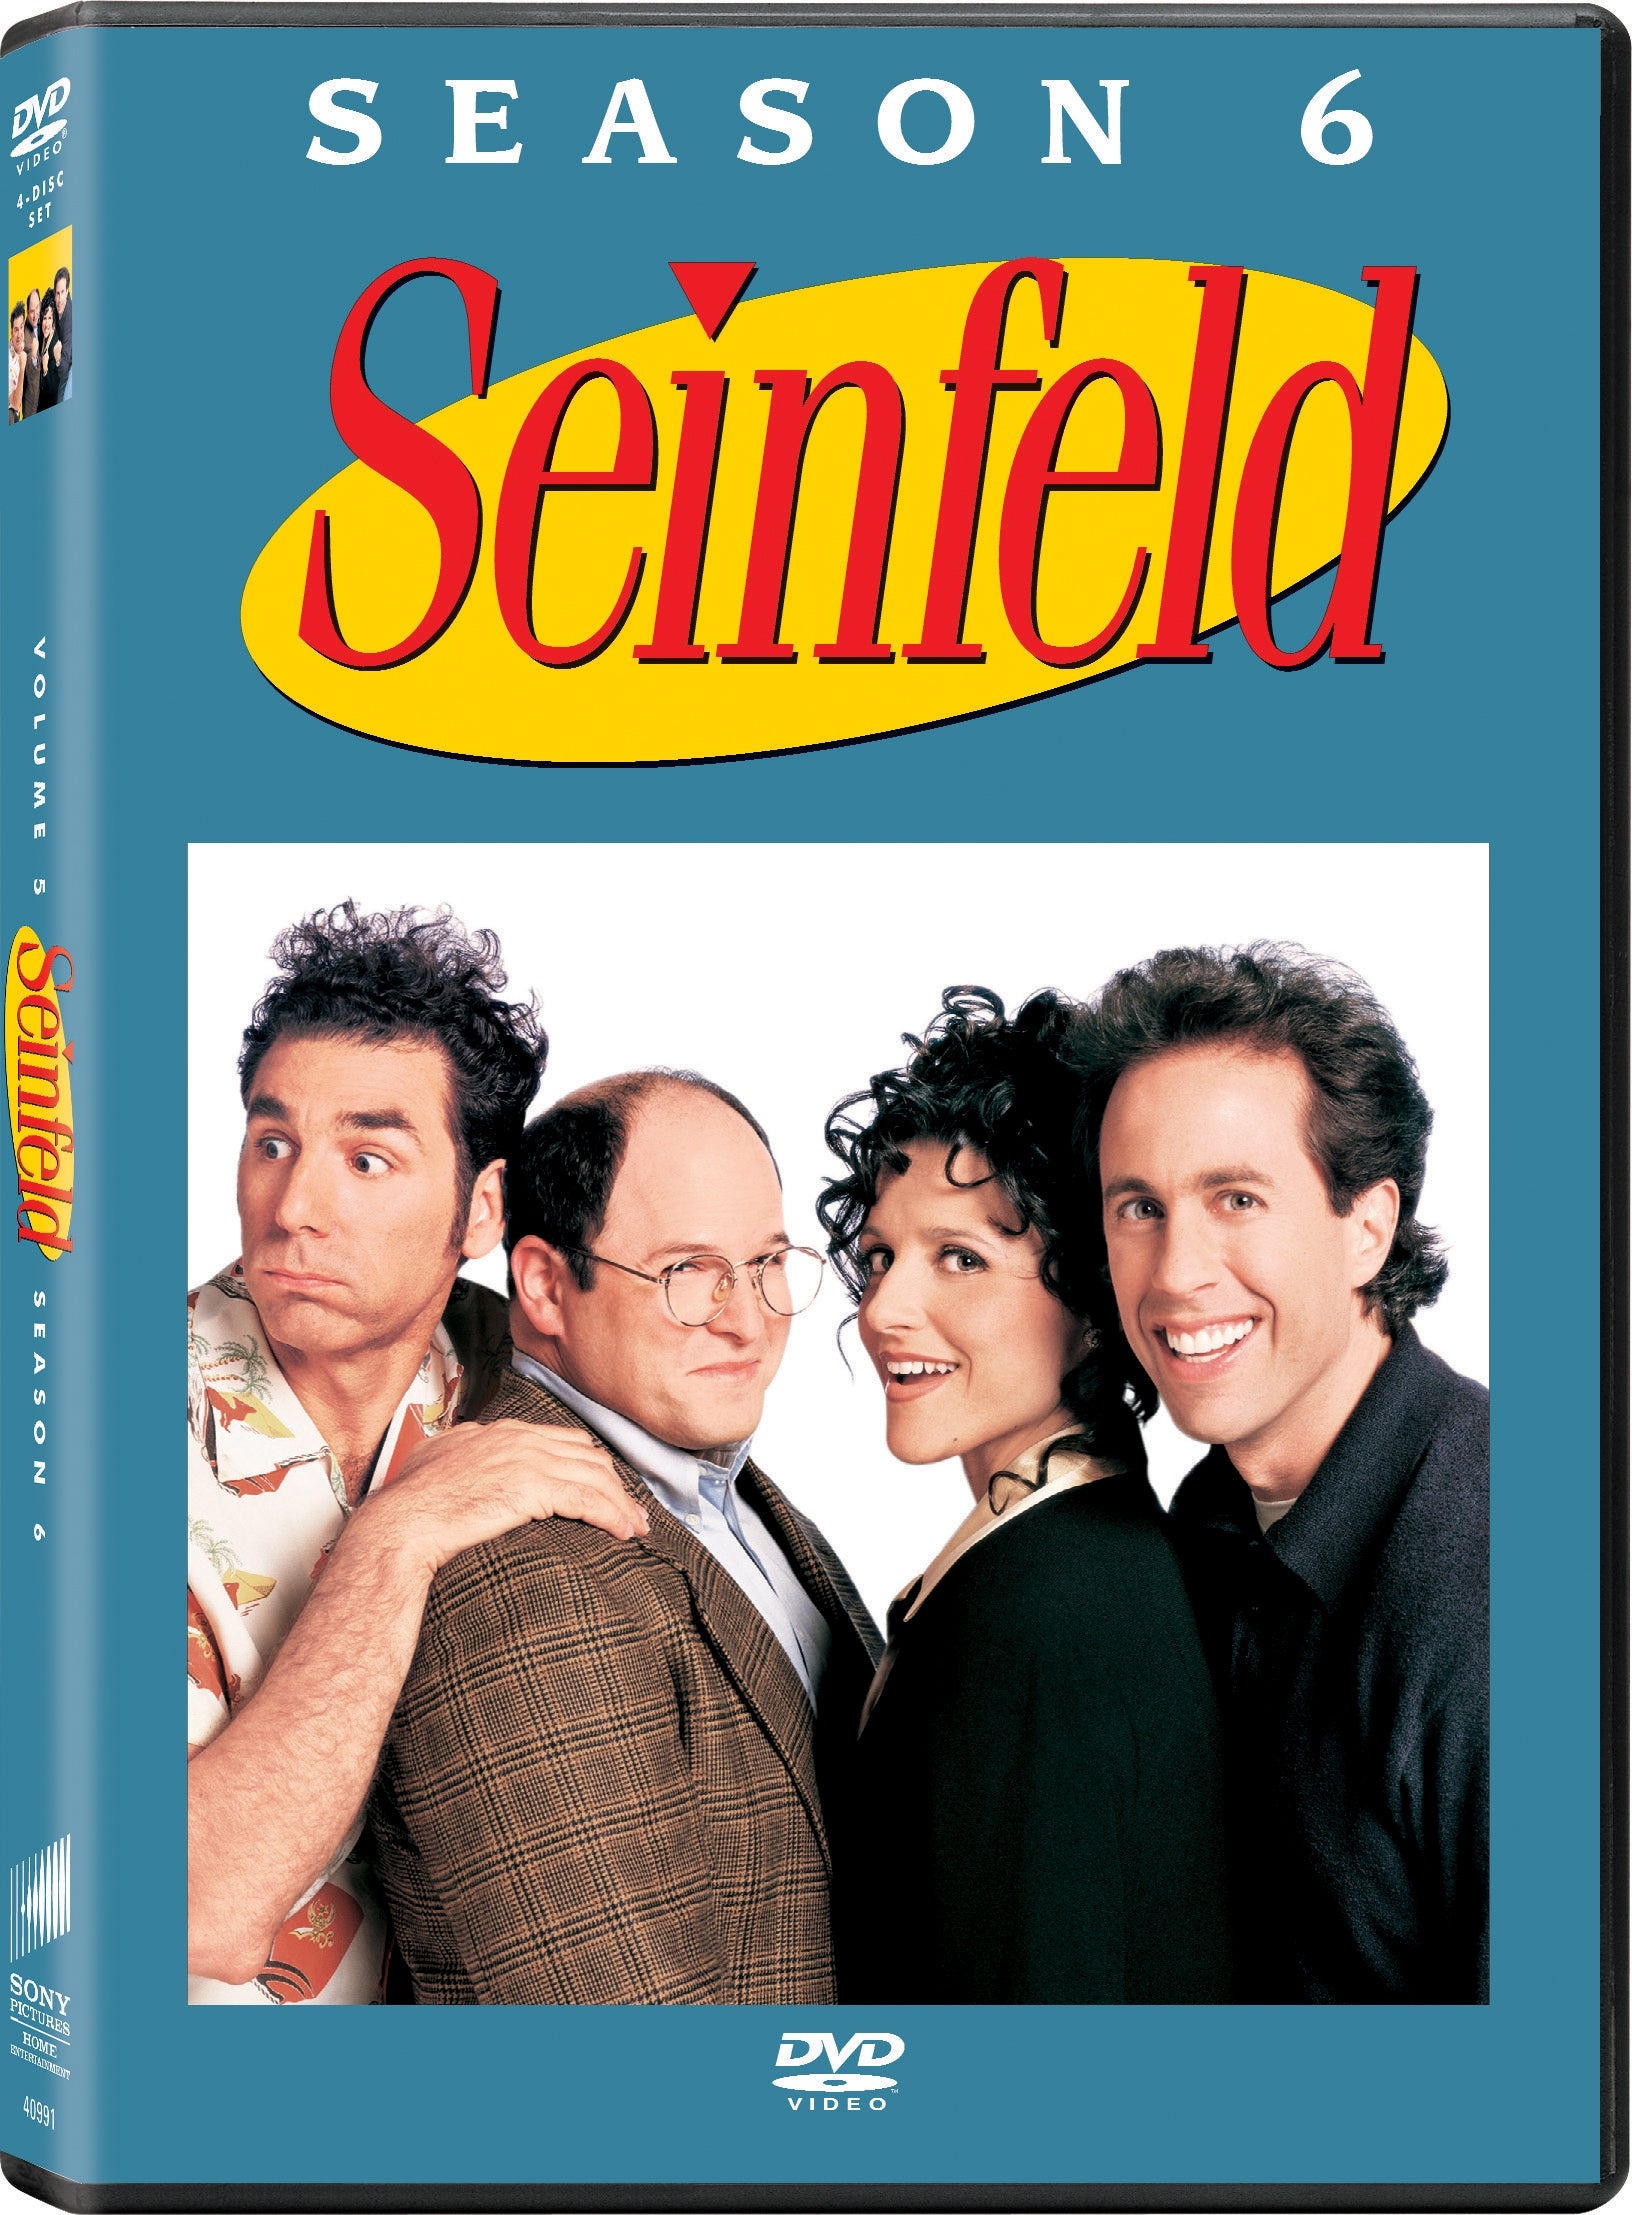 Seinfeld: The Complete 6th Season (DVD)